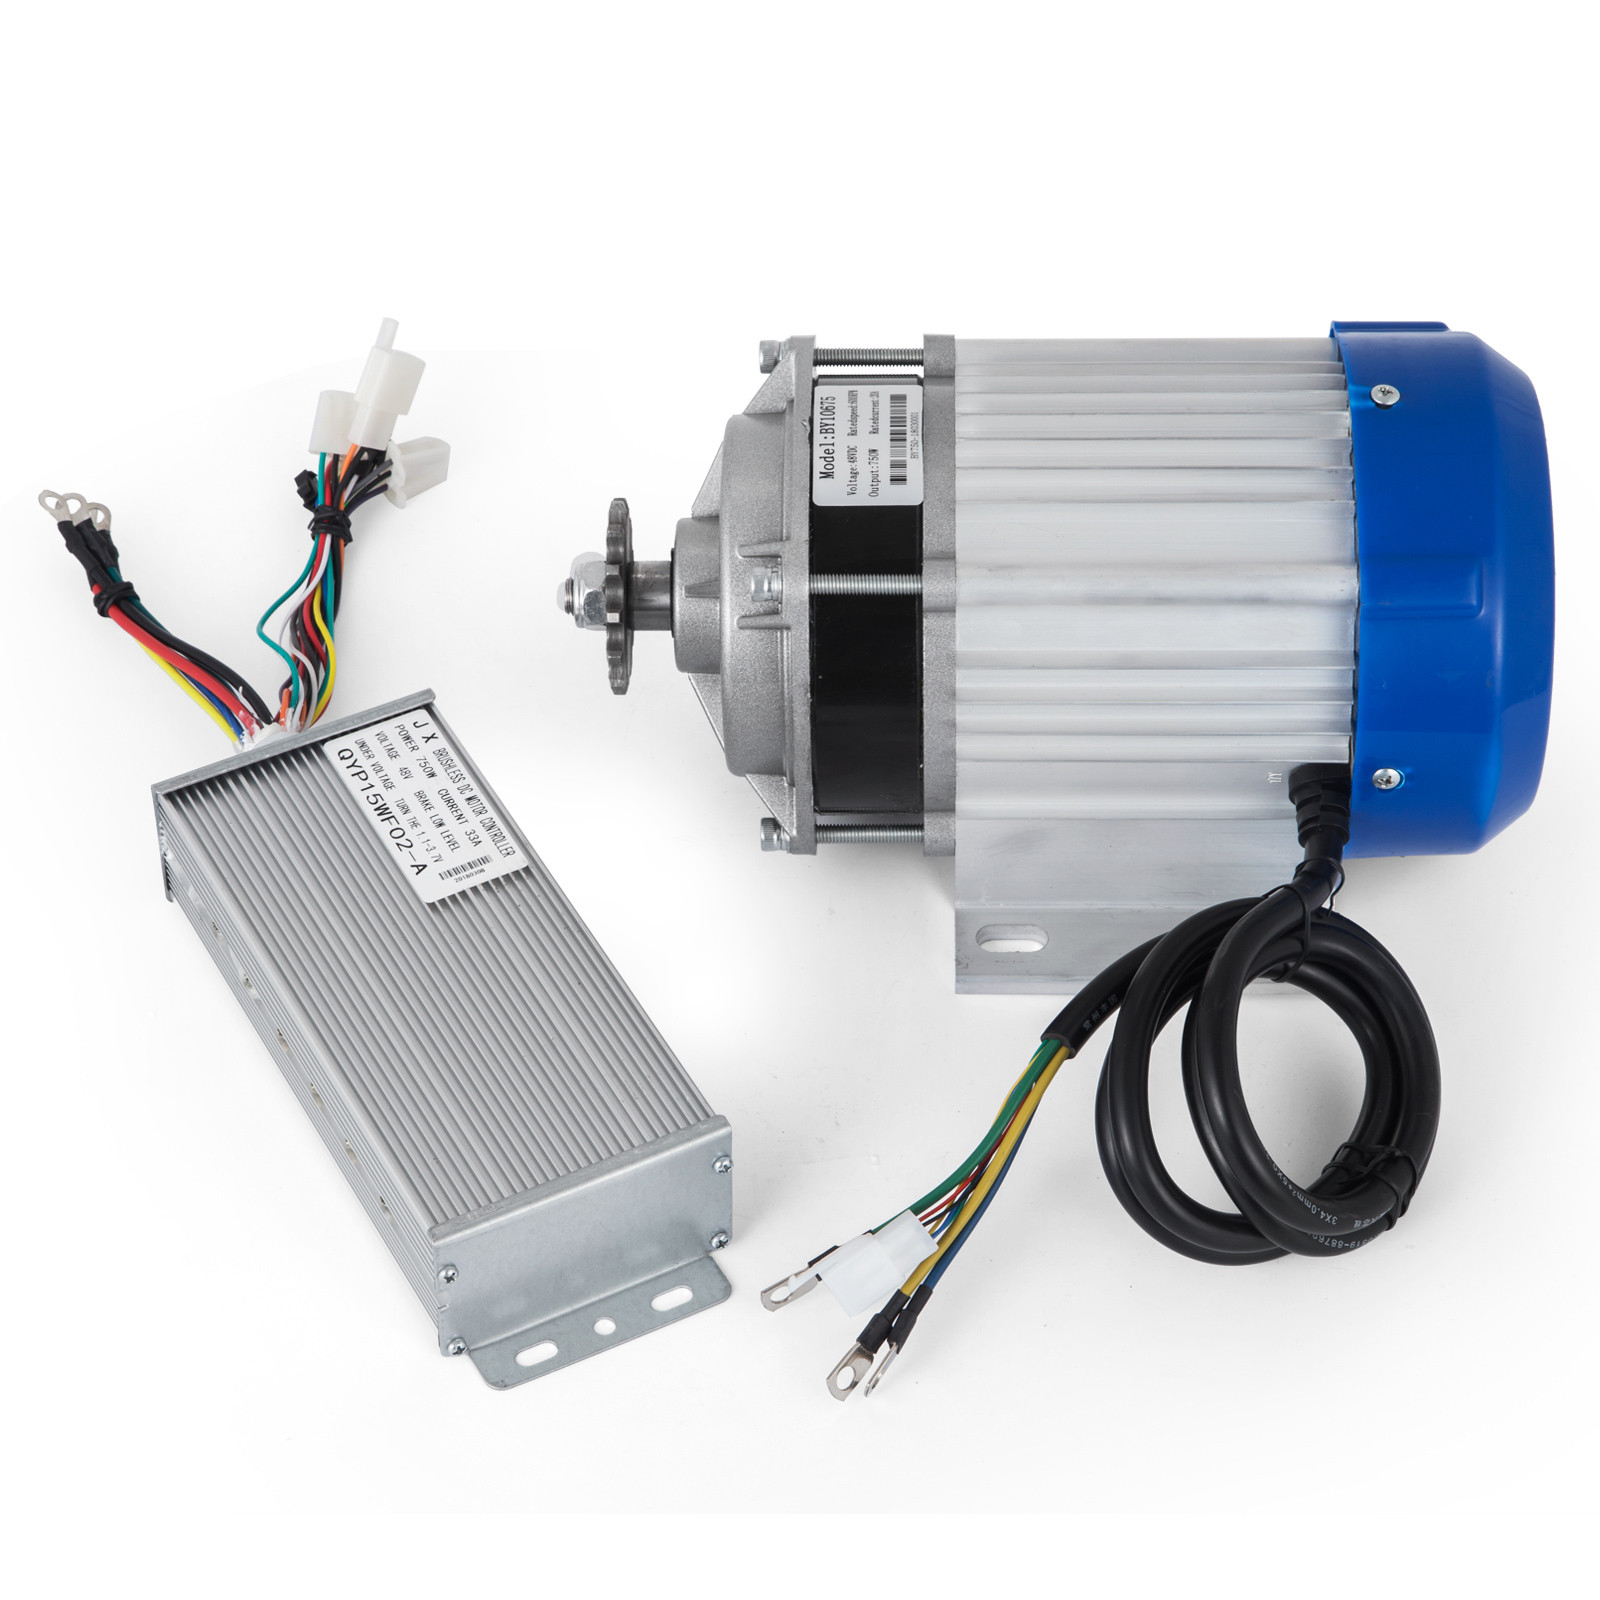 1800W-48V-DC-Brushless-Electric-Motor-Kit-f-Scooter-500-1800W-E-Bike-Go-Kart thumbnail 148